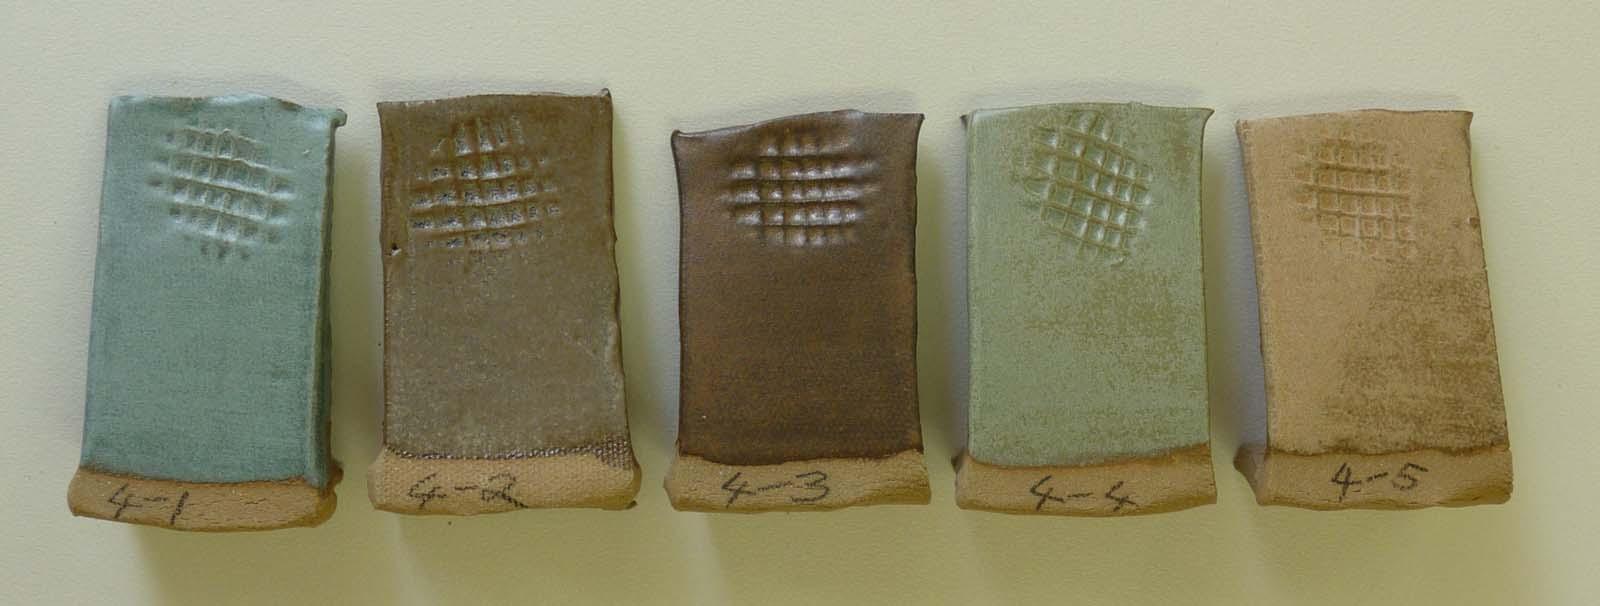 Bonsai Amp Pottery August 2012